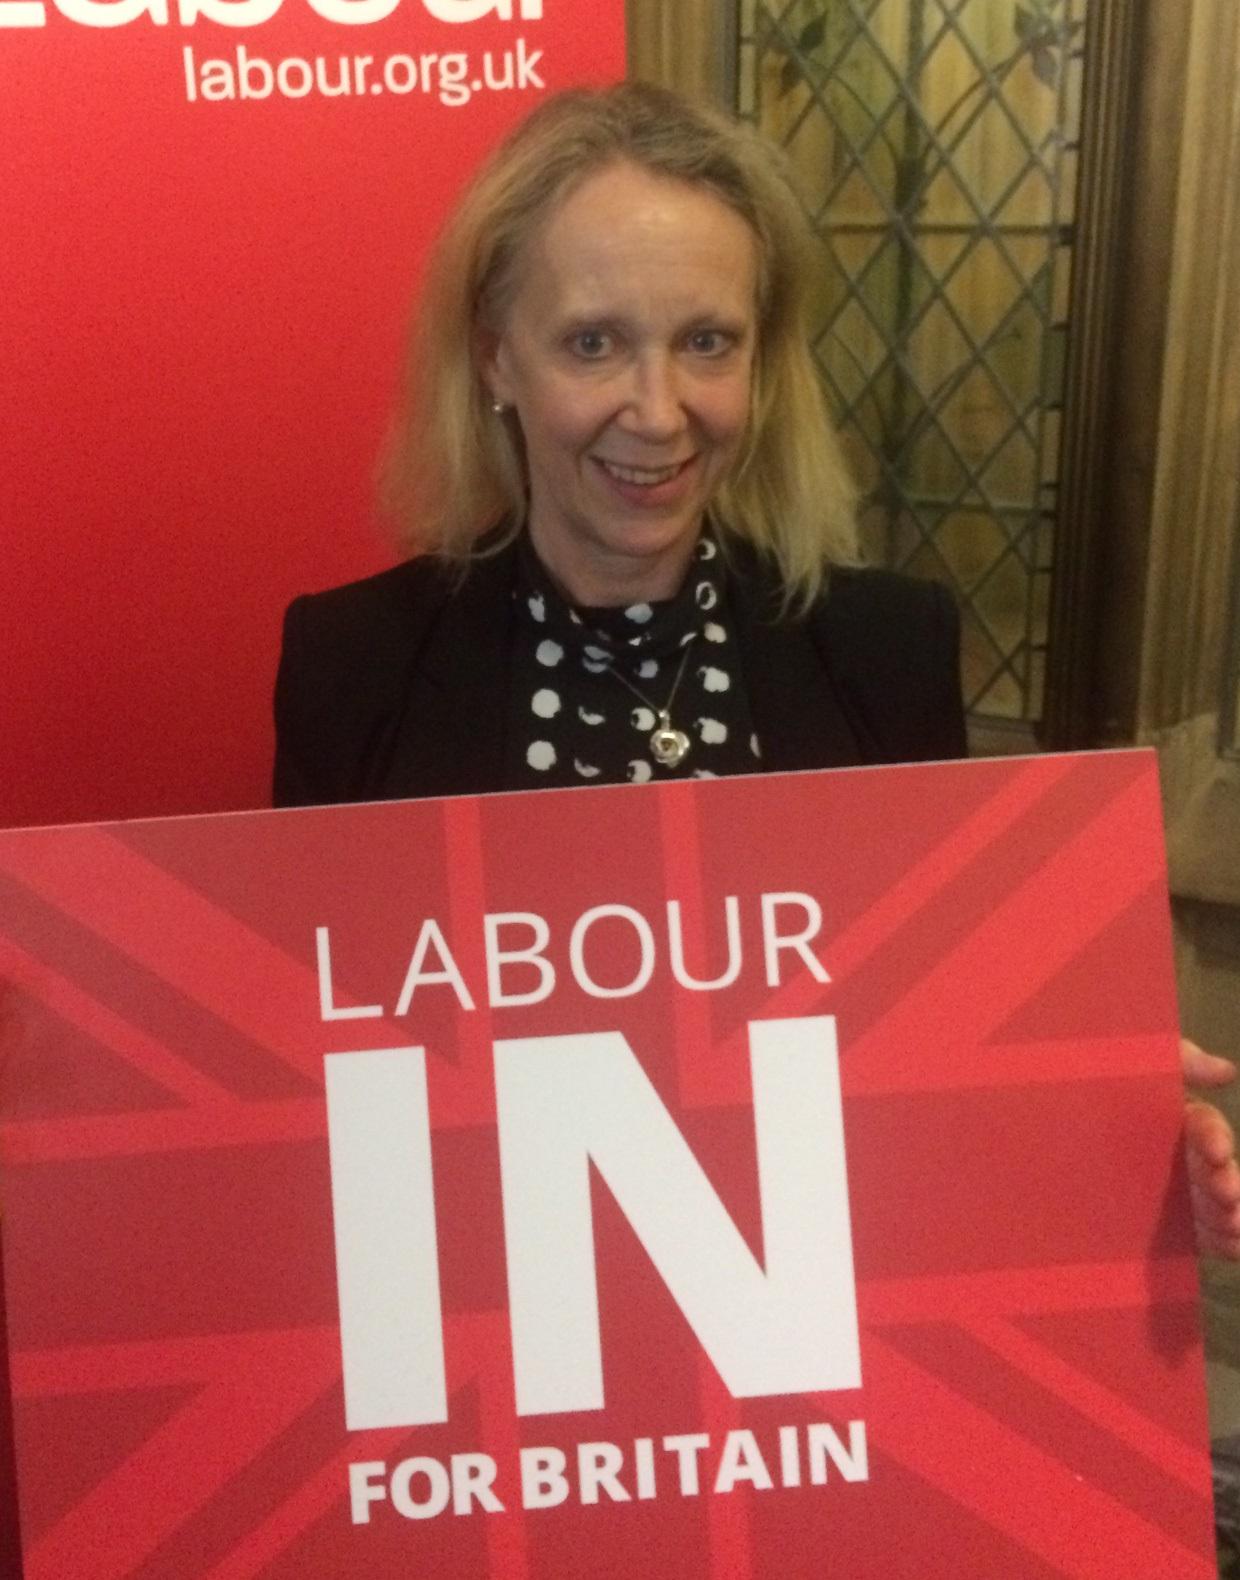 Liz_McInnes_Labour_IN.JPG